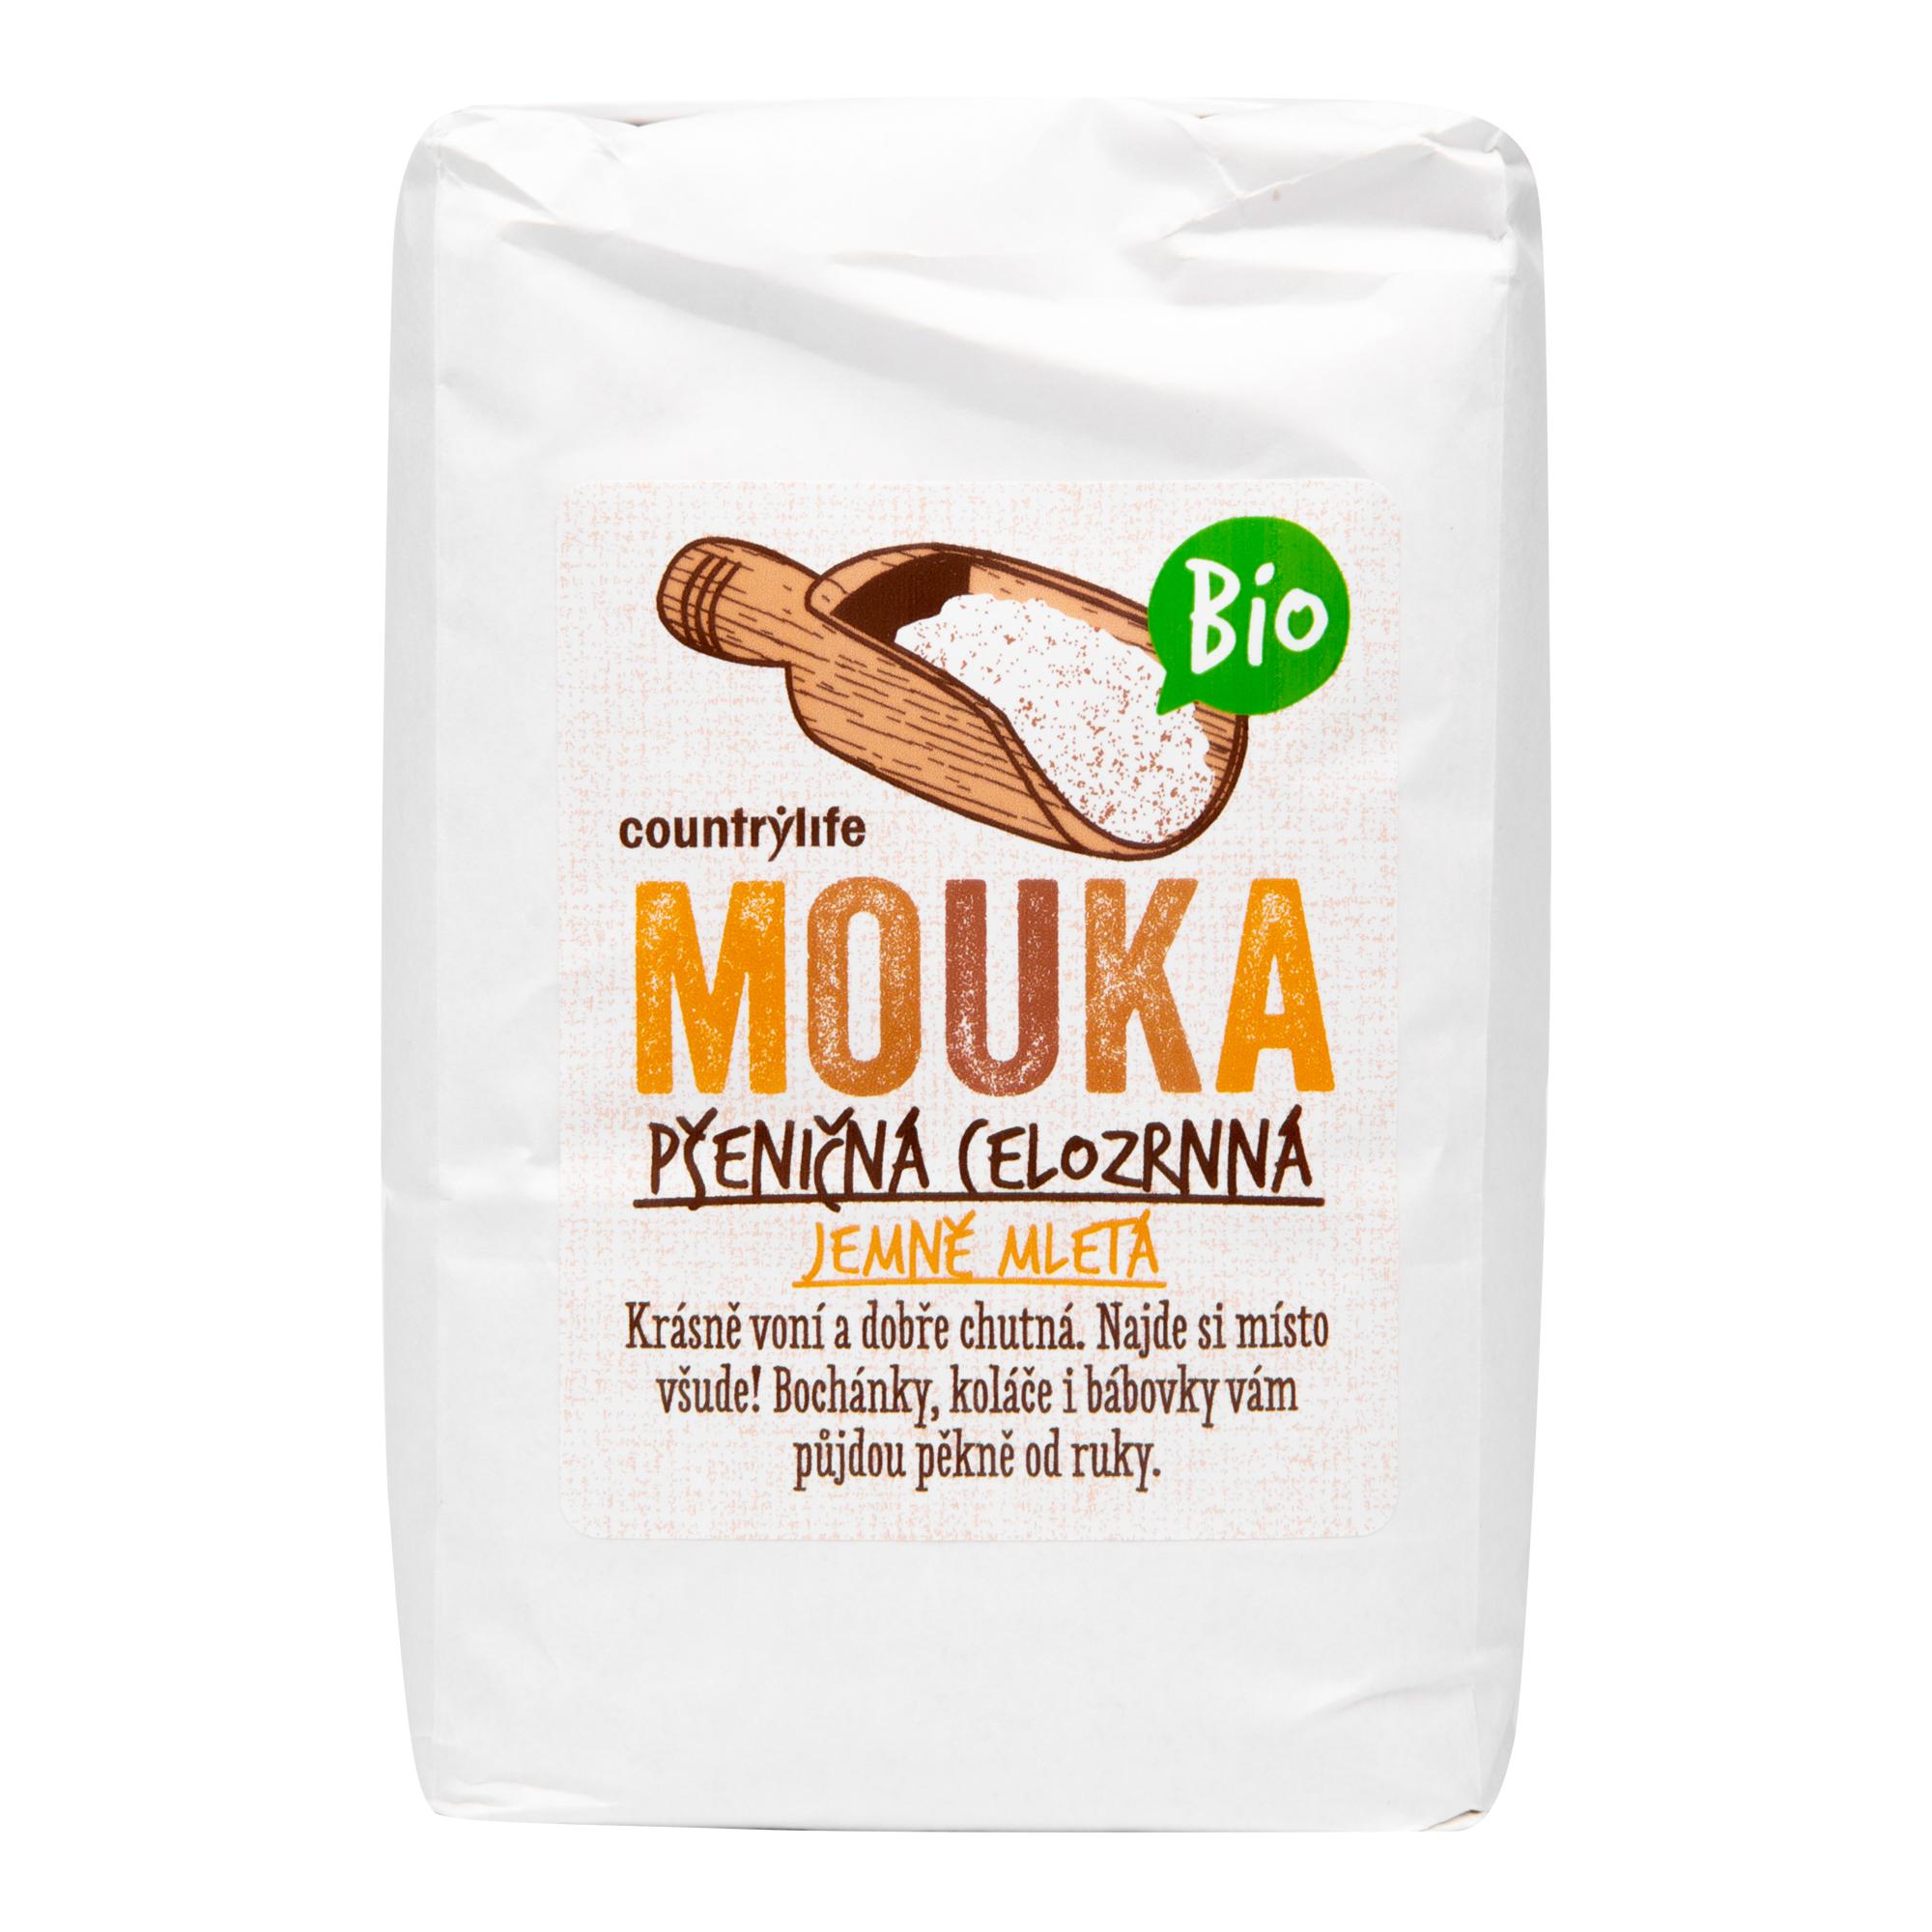 Mouka pšeničná celozrnná jemně mletá 1 kg BIO COUNTRY LIFE